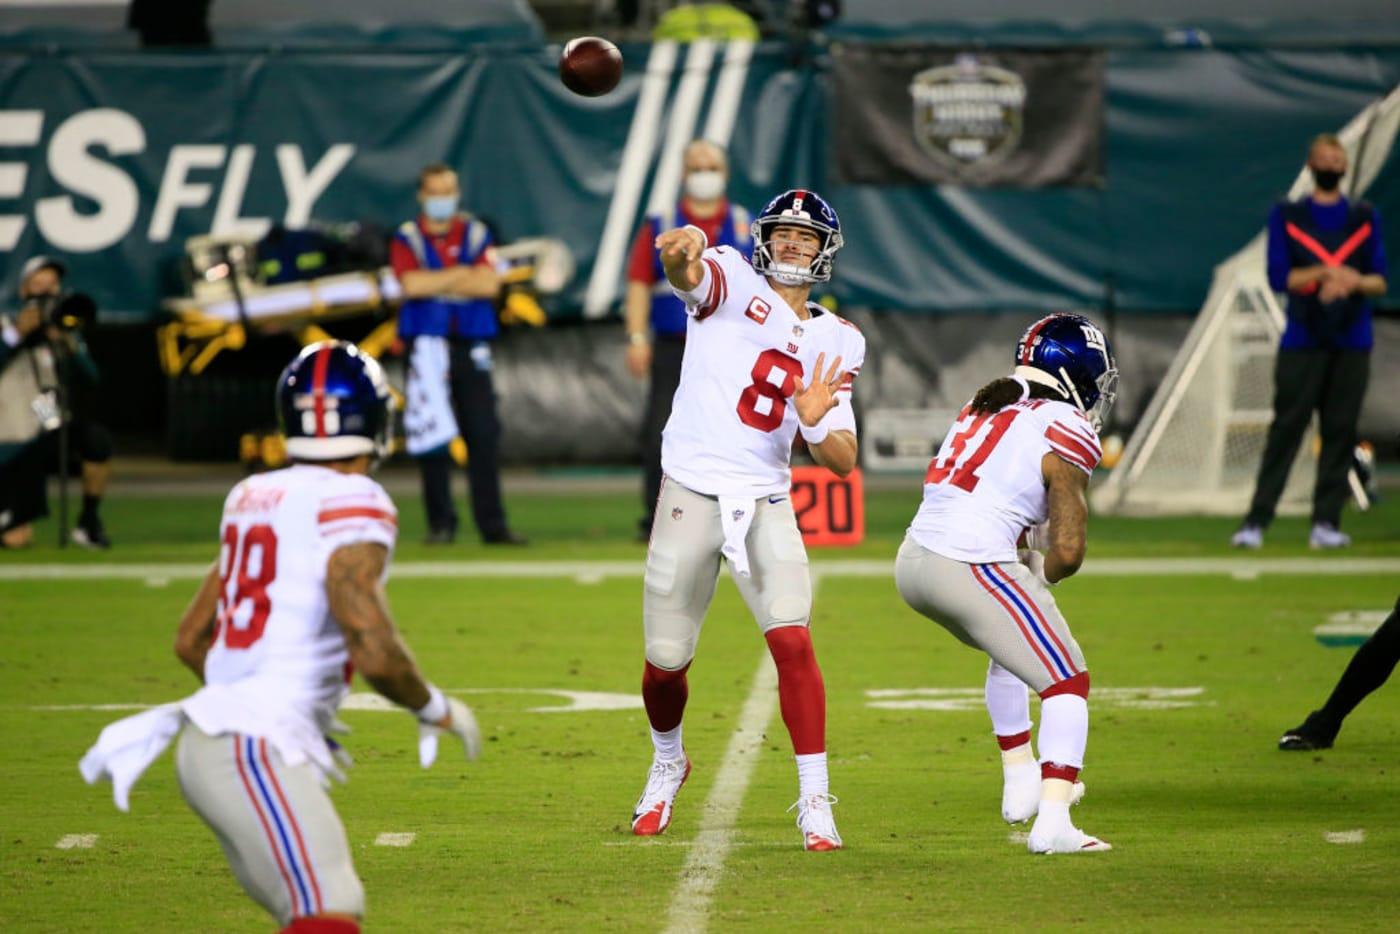 Danile Jones Evan Engram Giants Eagles 2020